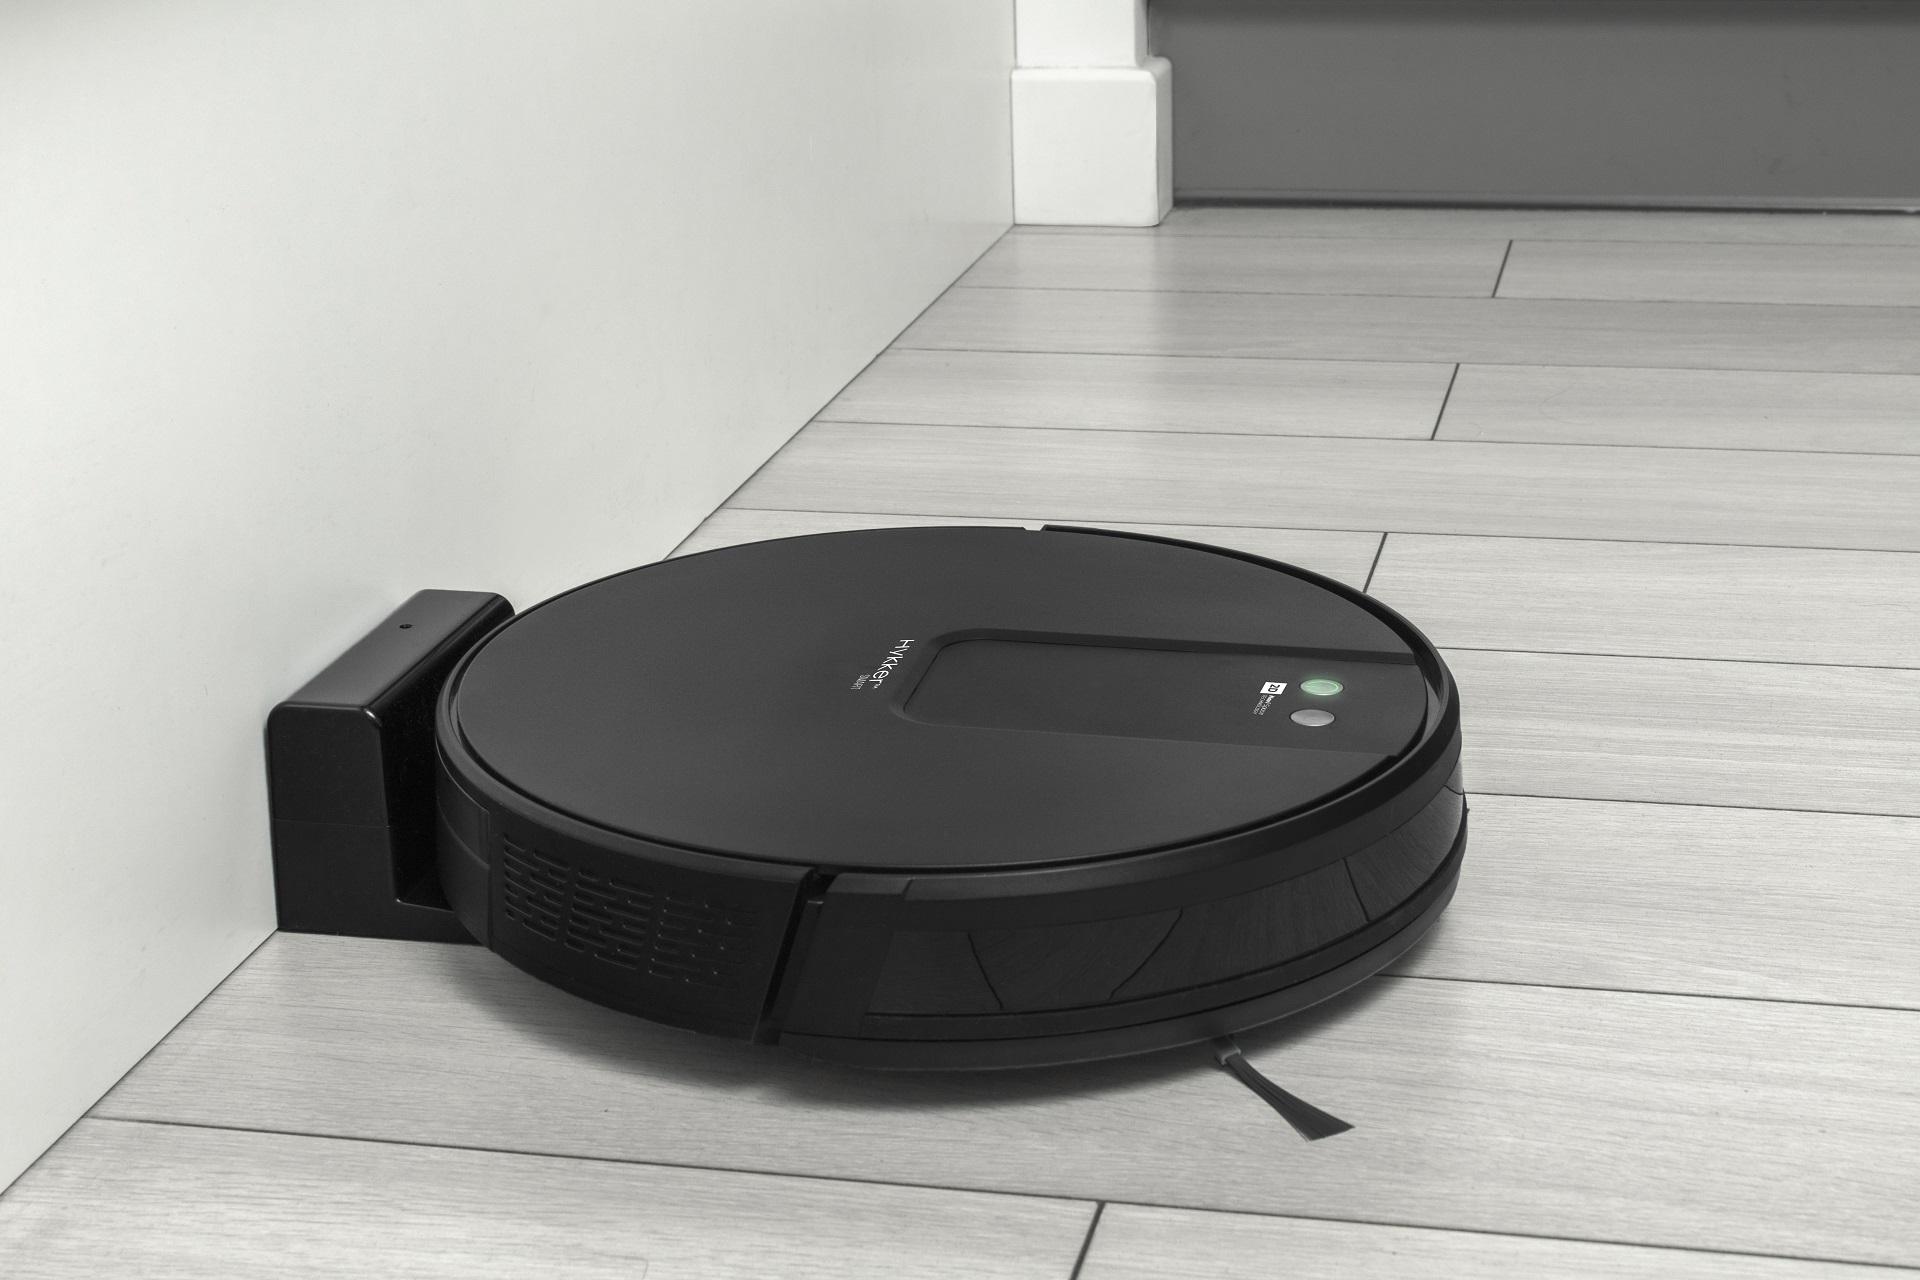 Hykker Navi Space vacuum robot